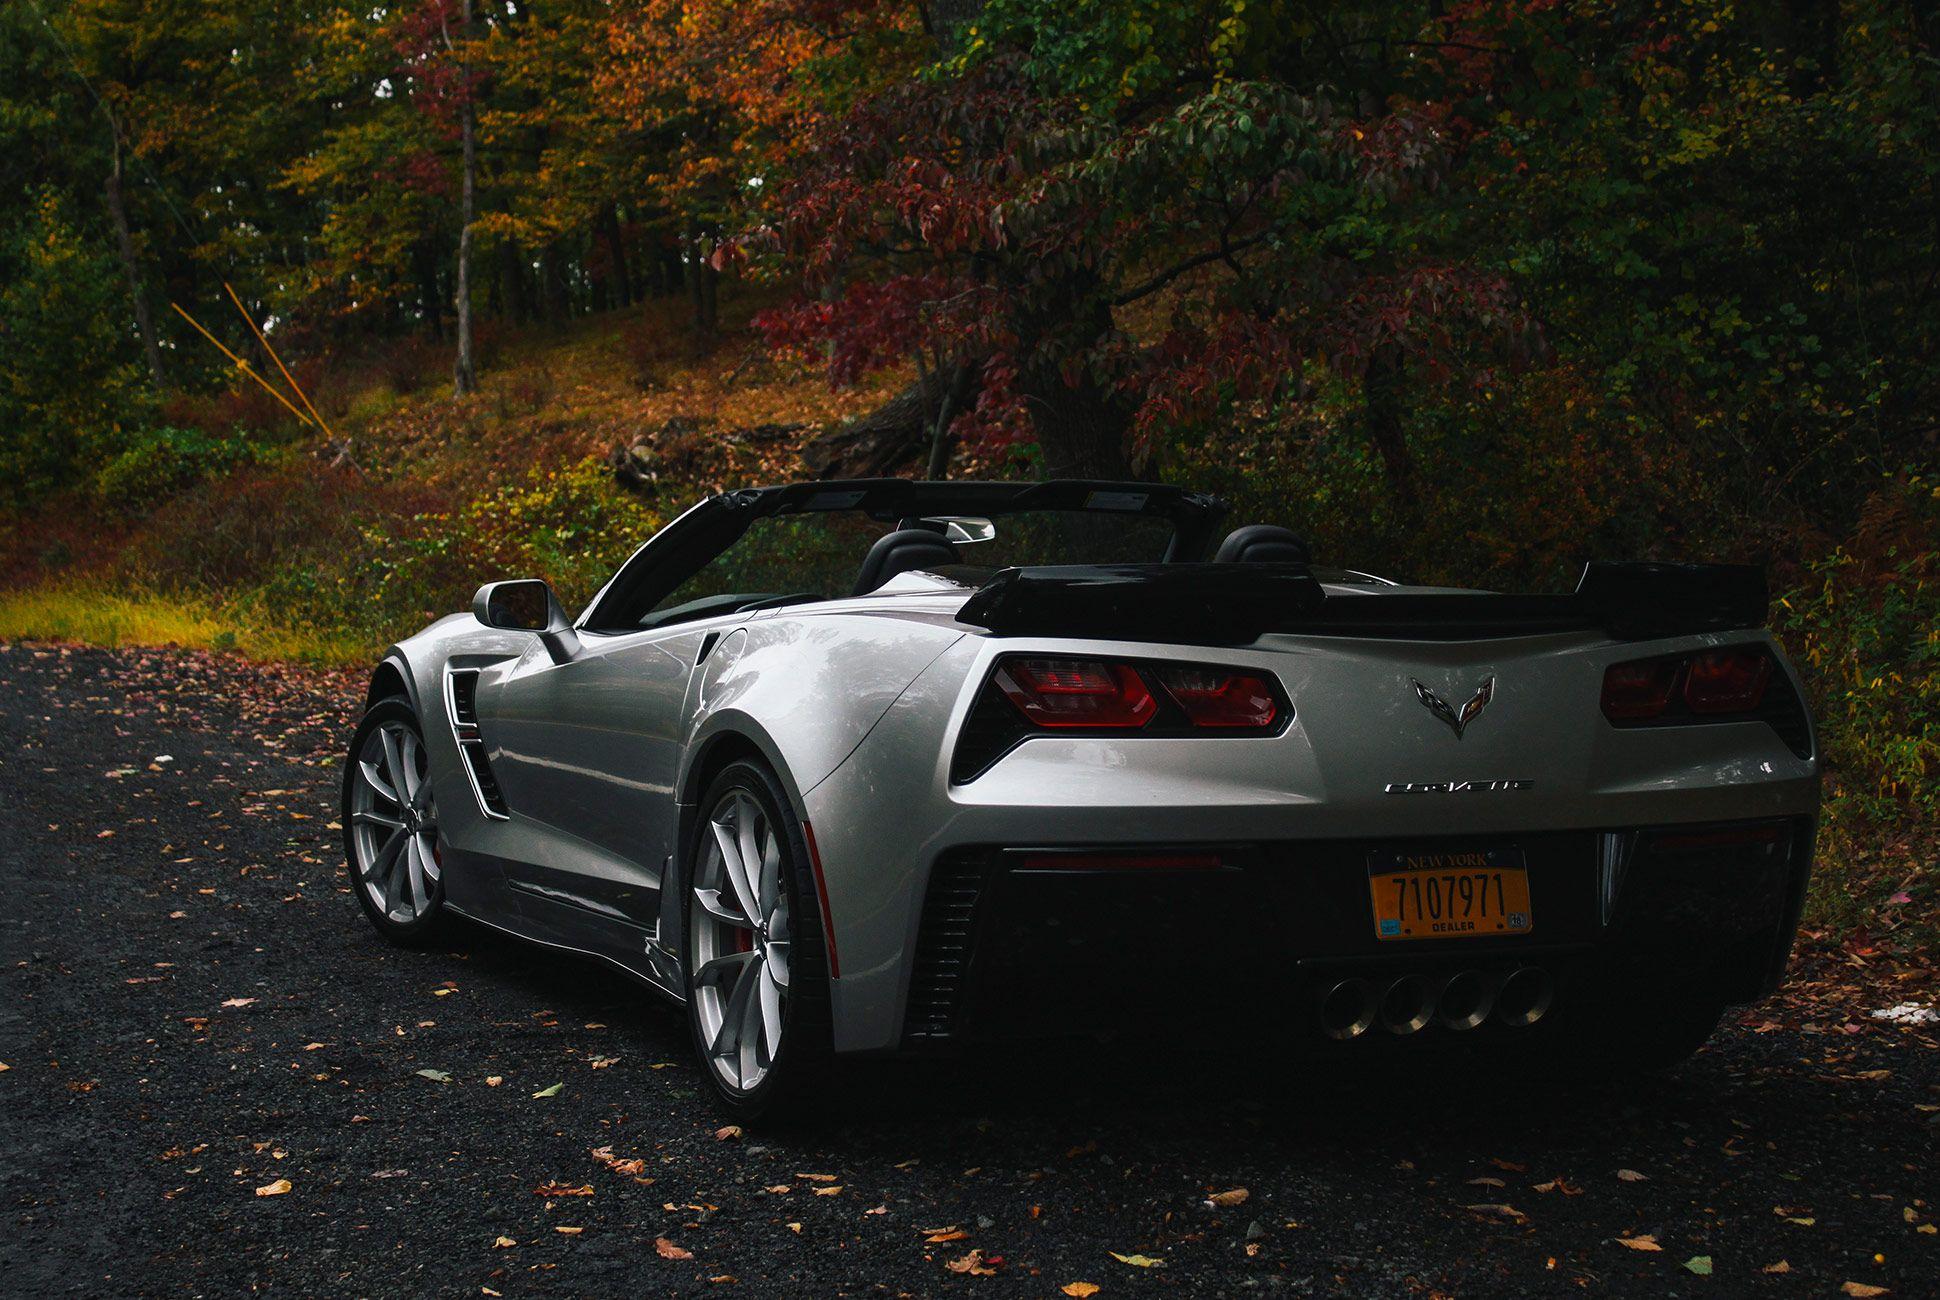 Corvette-2018-gear-patrol-2